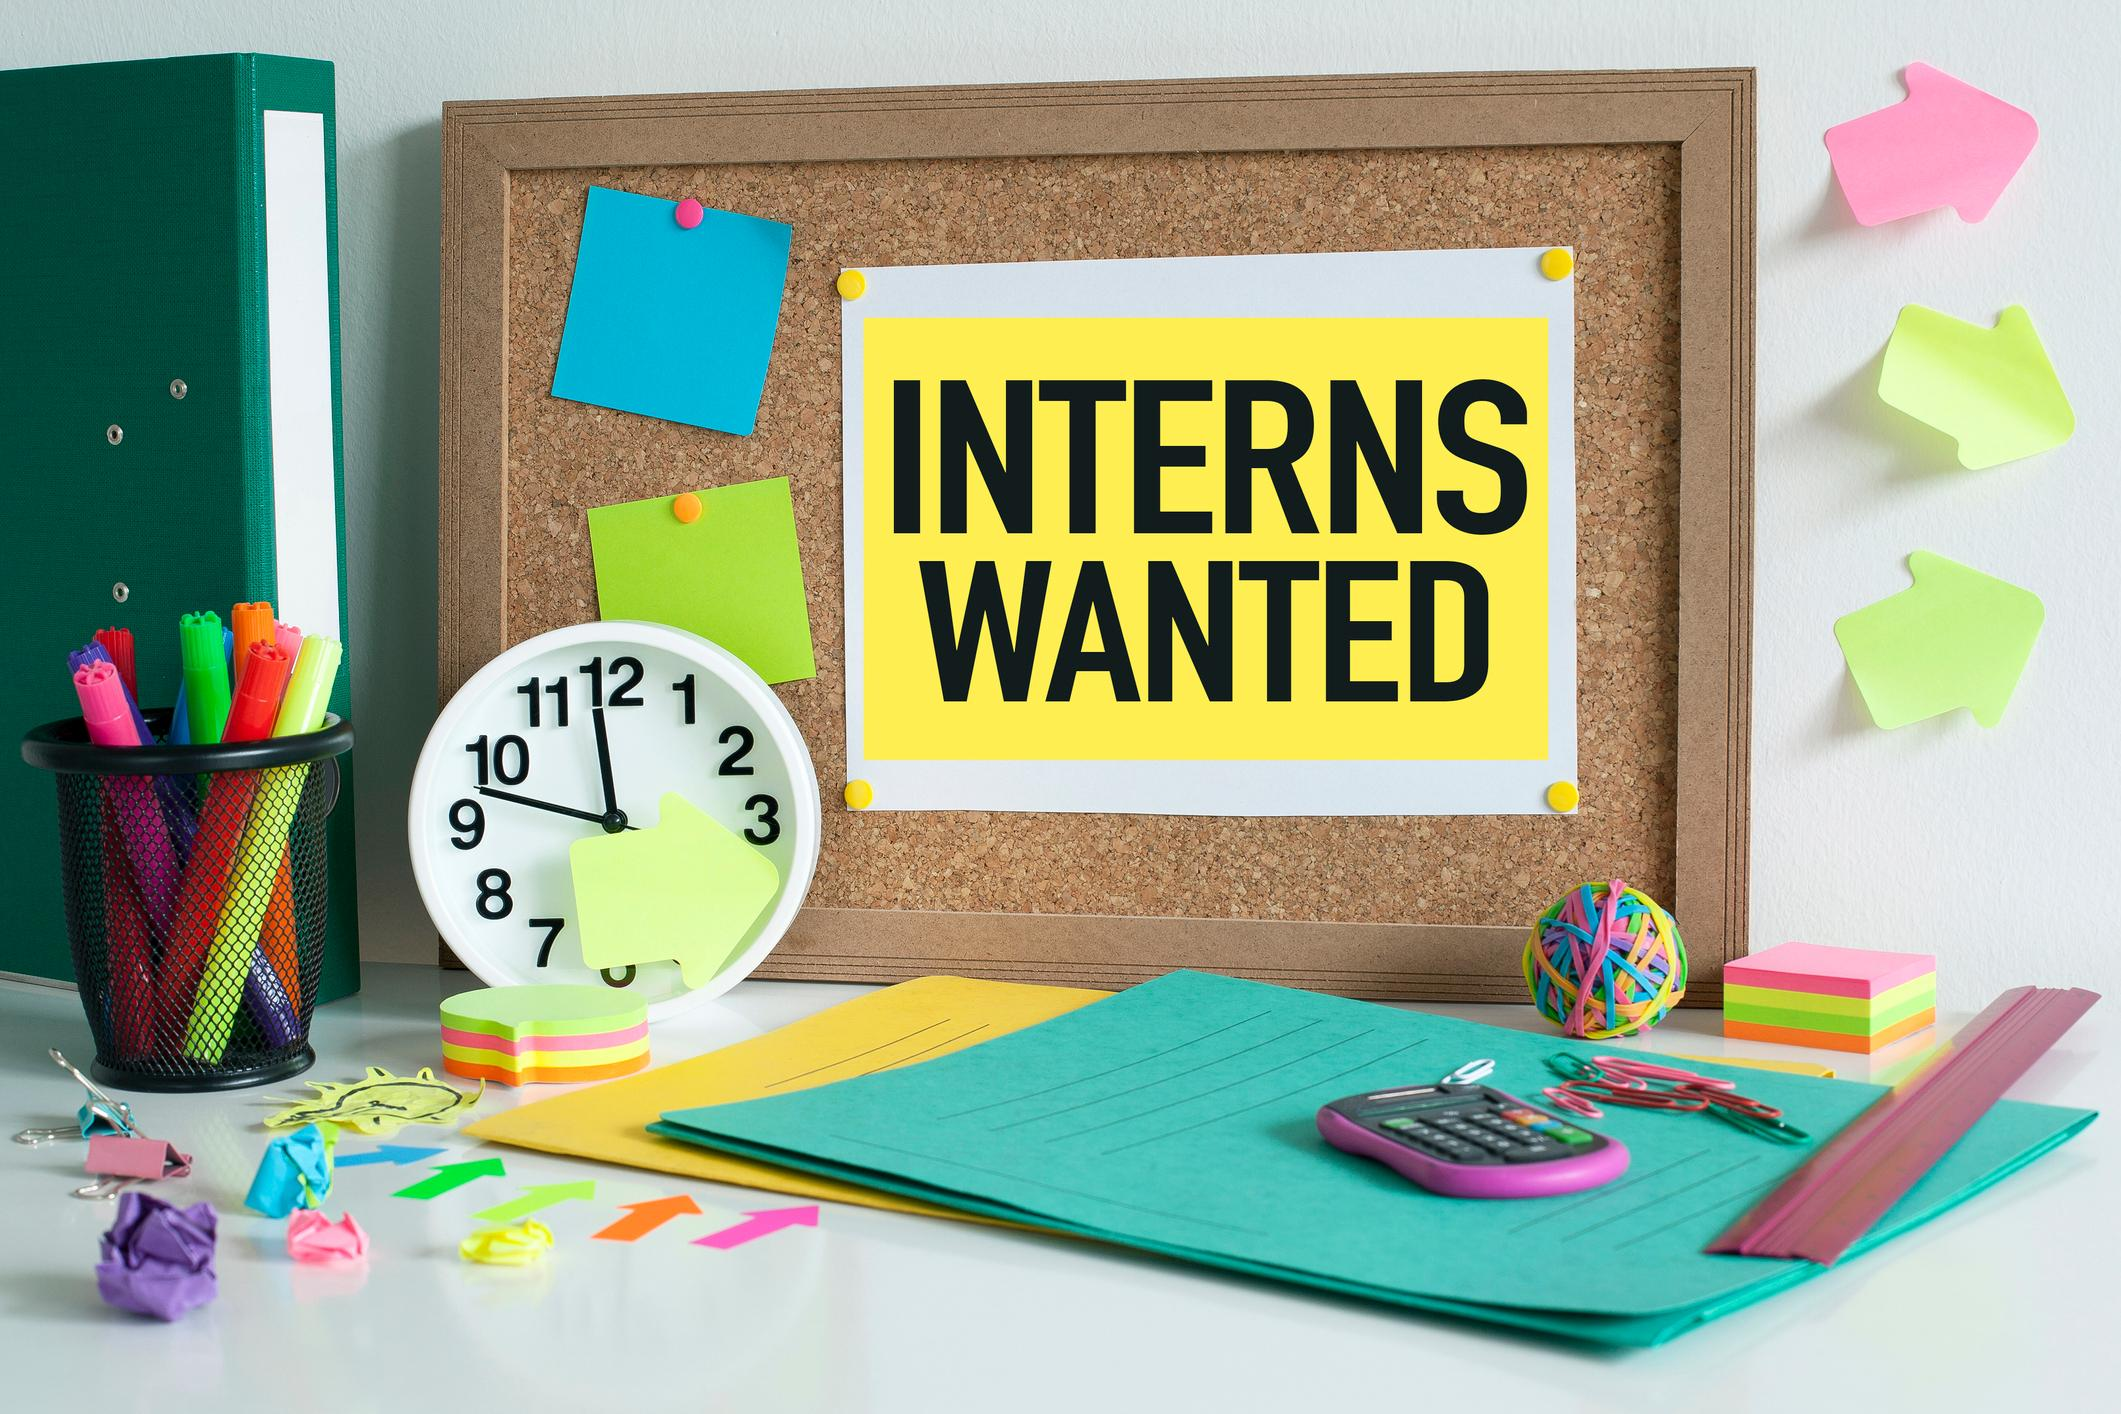 internship canceled feature